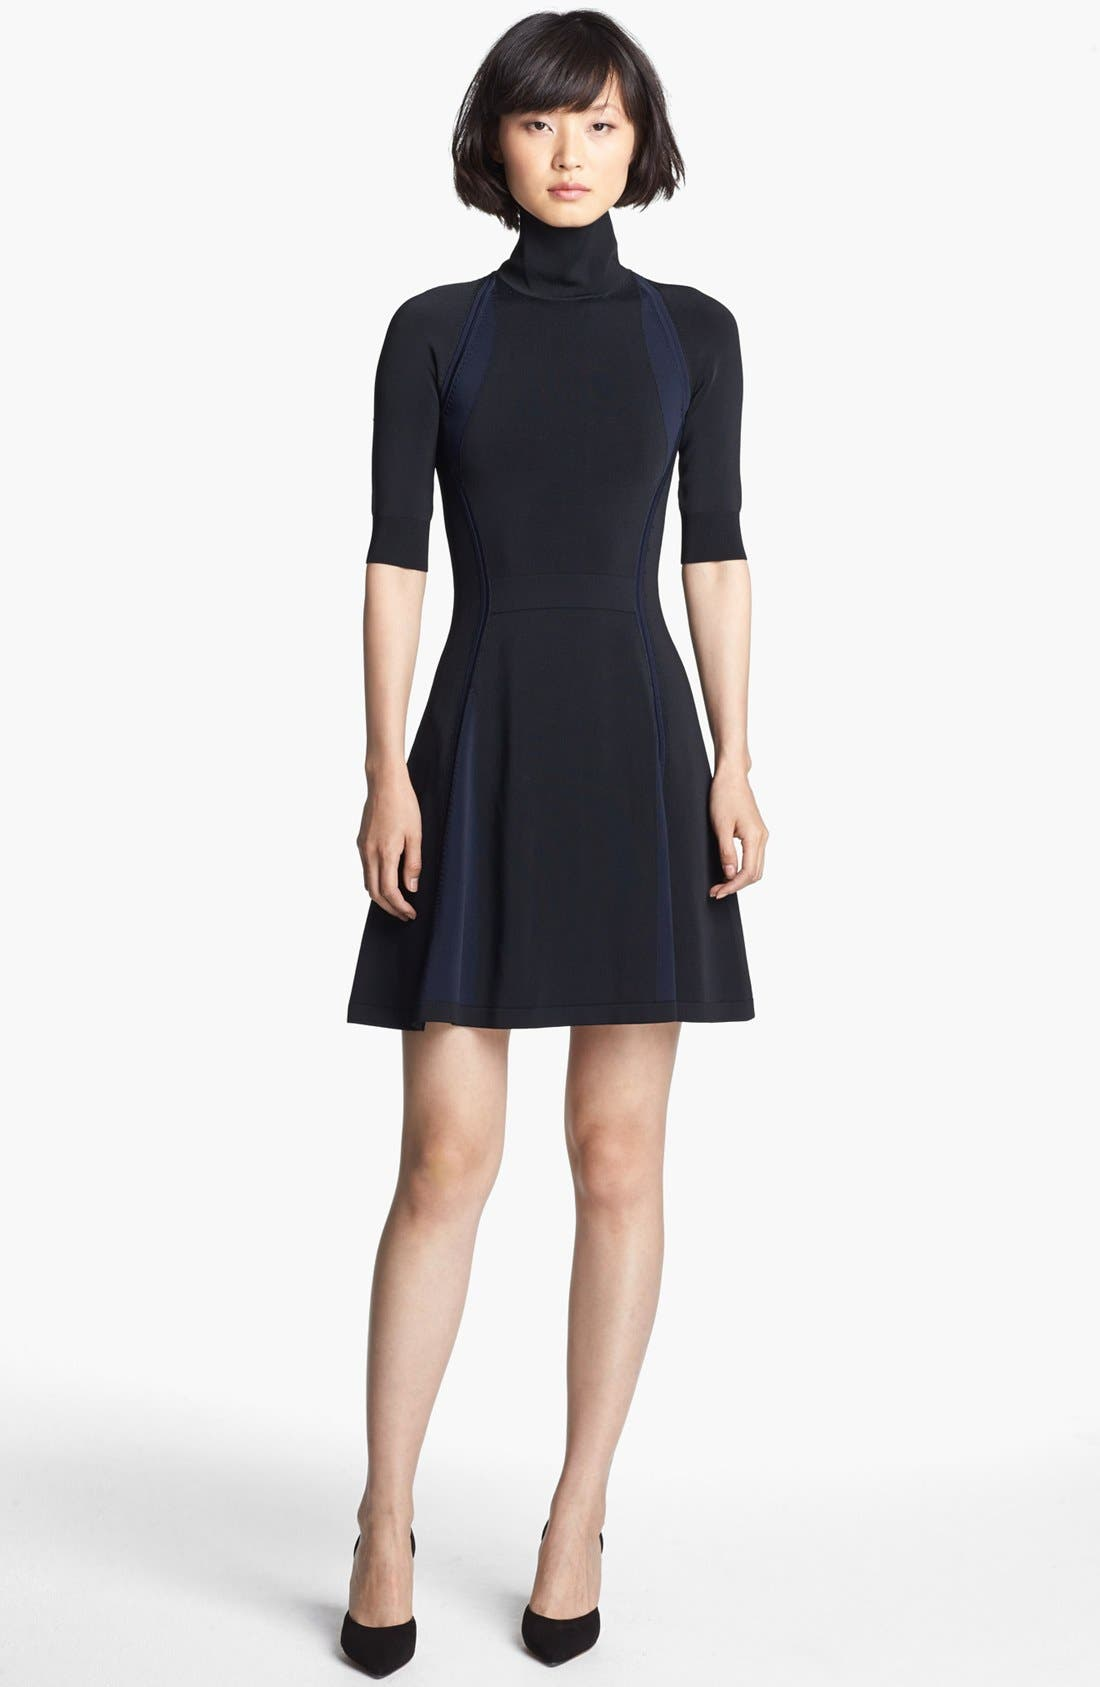 Main Image - A.L.C. 'Manivet' Dress